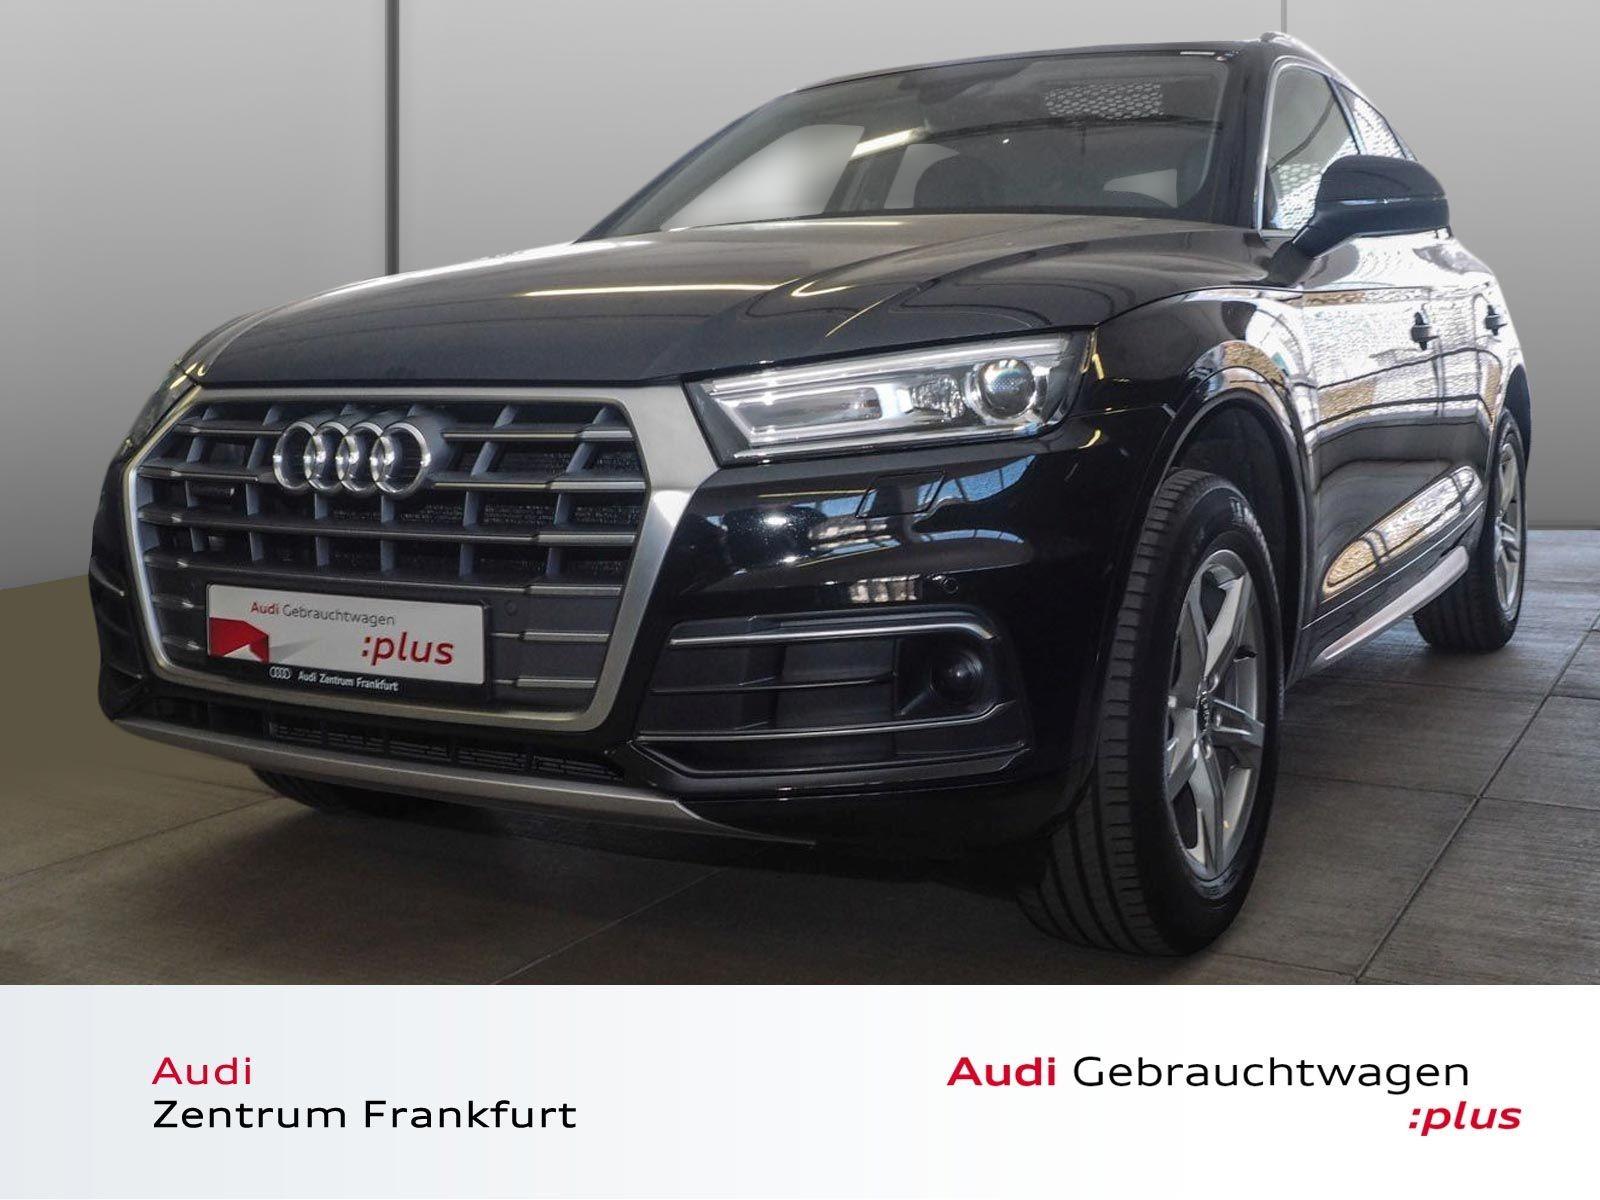 Audi Q5 2.0 TDI quattro S tronic ACC Pano Navi Leder, Jahr 2018, Diesel